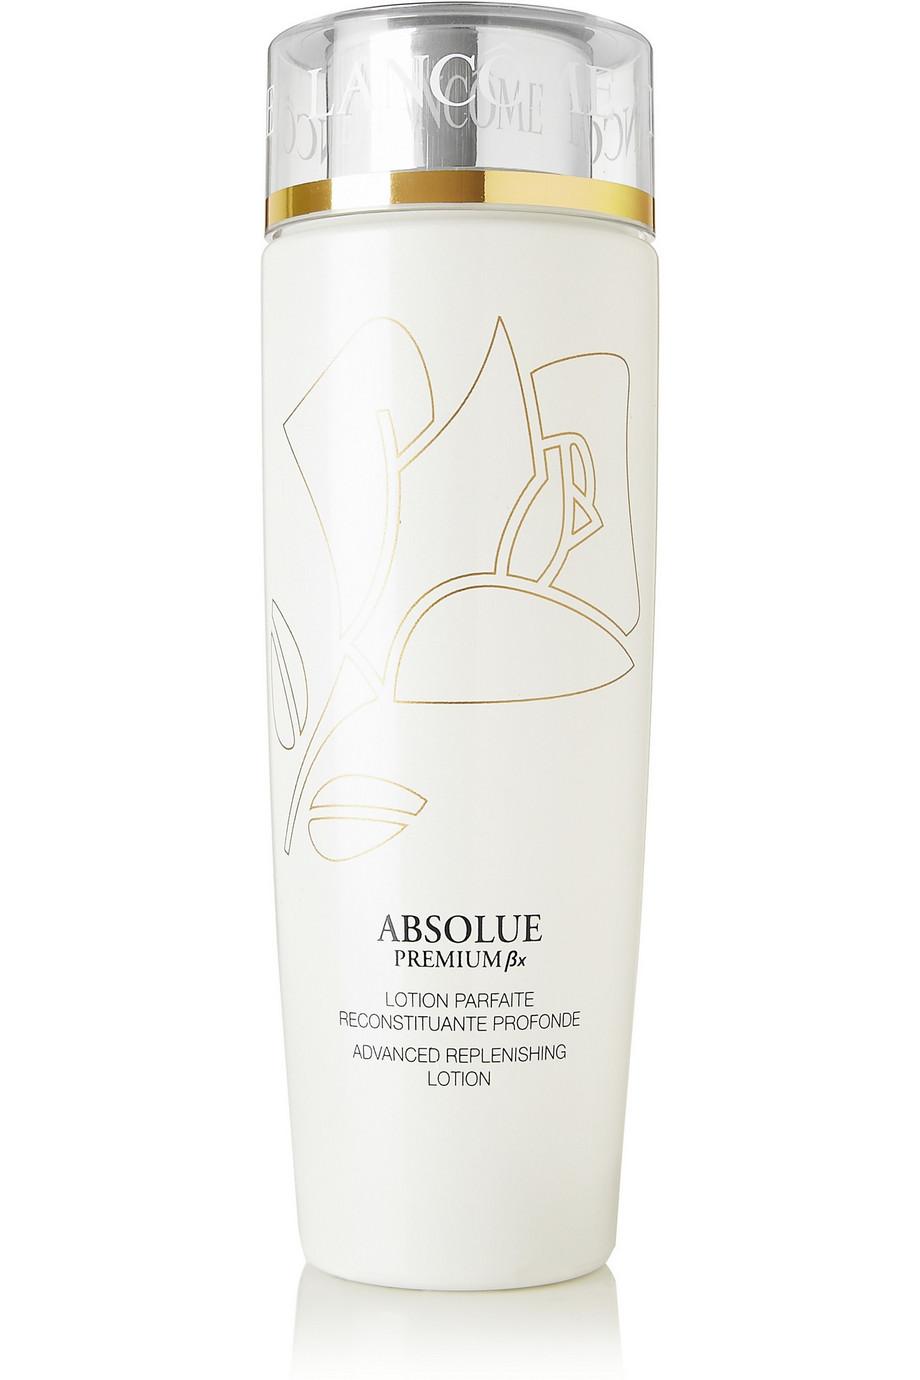 Absolue Premium SSx Advanced Replenishing Toner, 150ml, by Lancôme